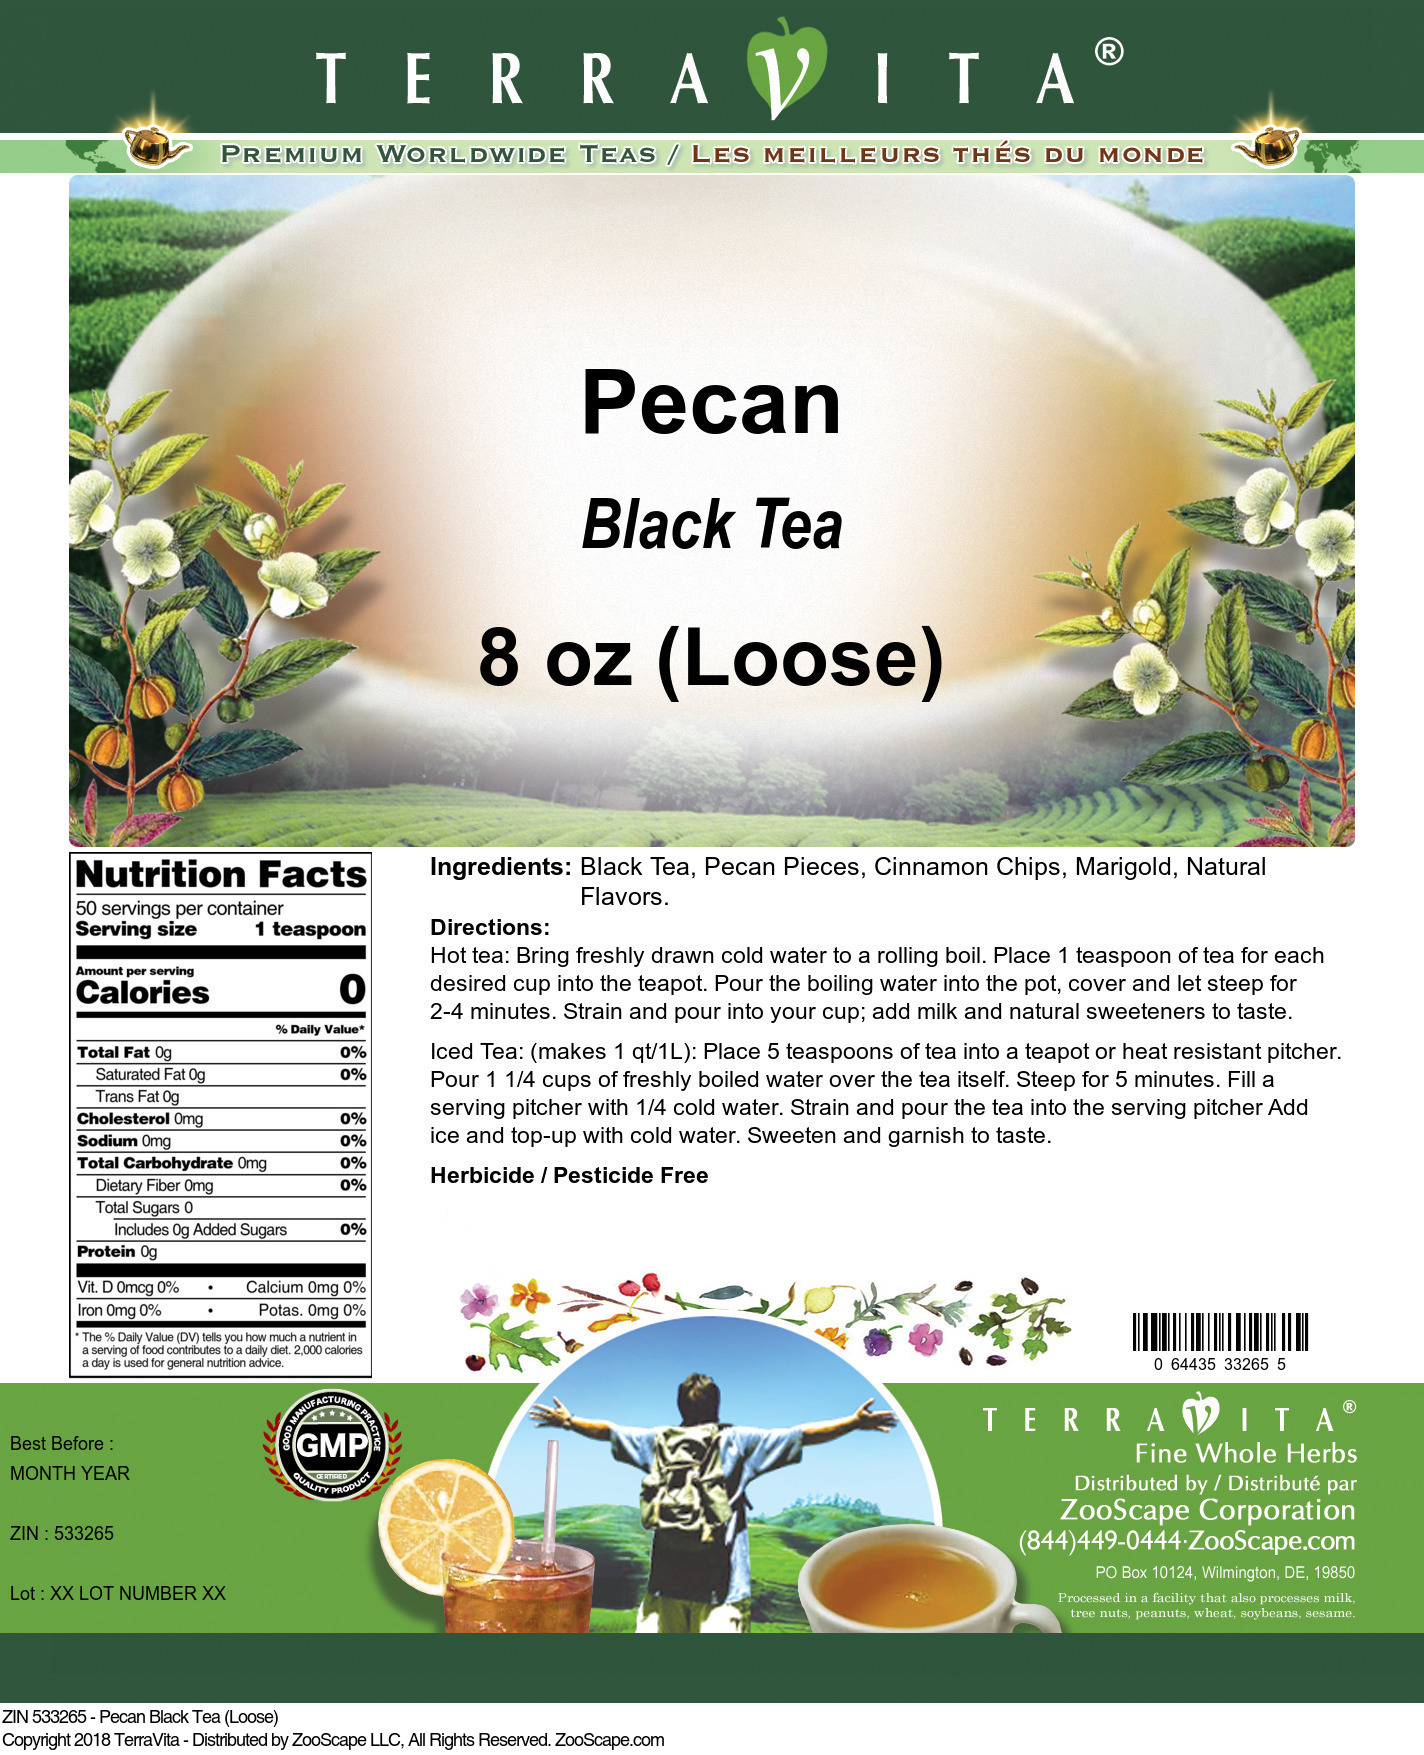 Pecan Black Tea (Loose)